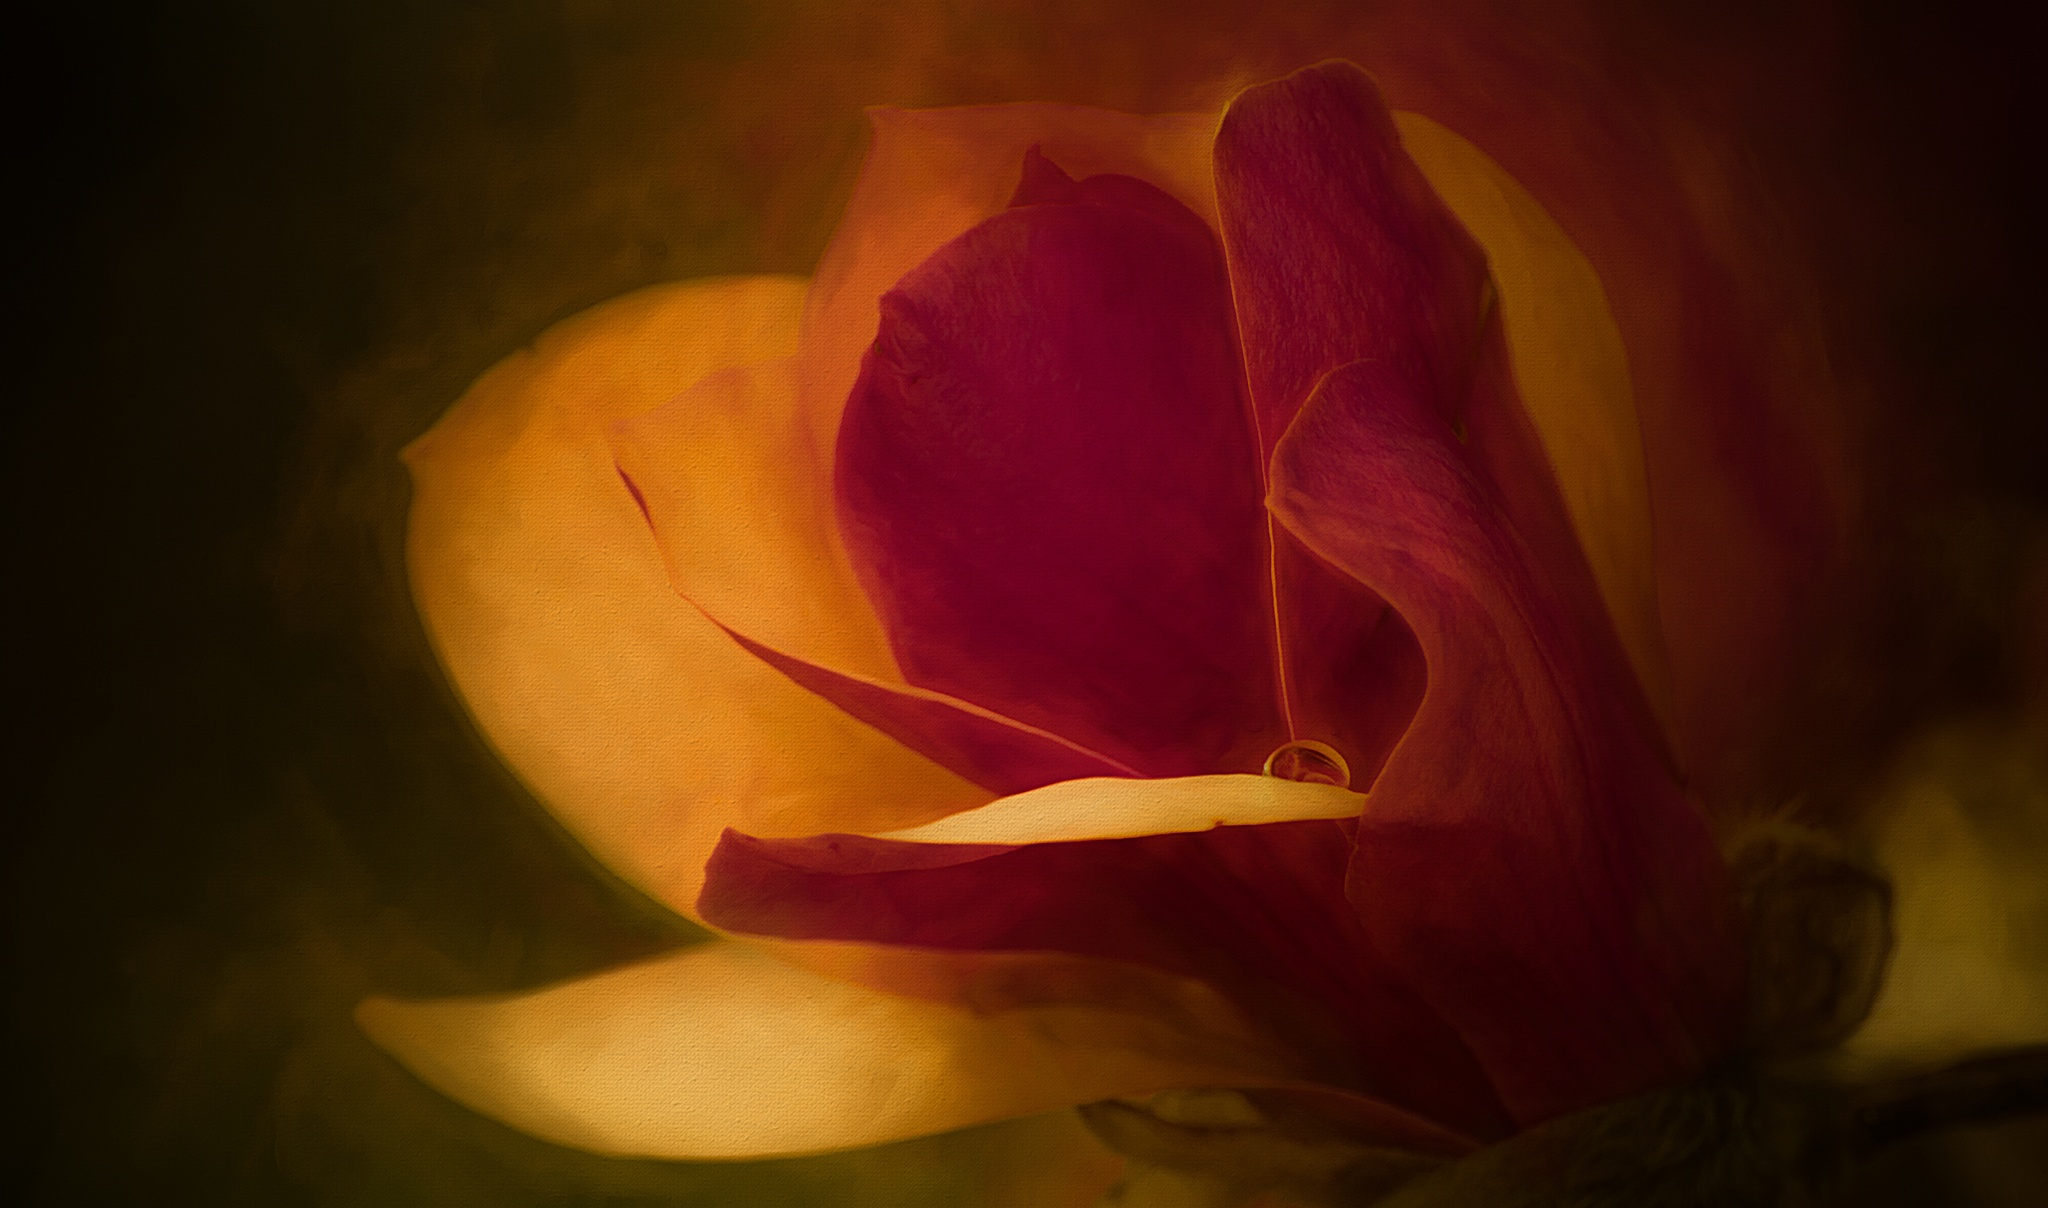 Magnolia Dreams 434 by JohnEllingson